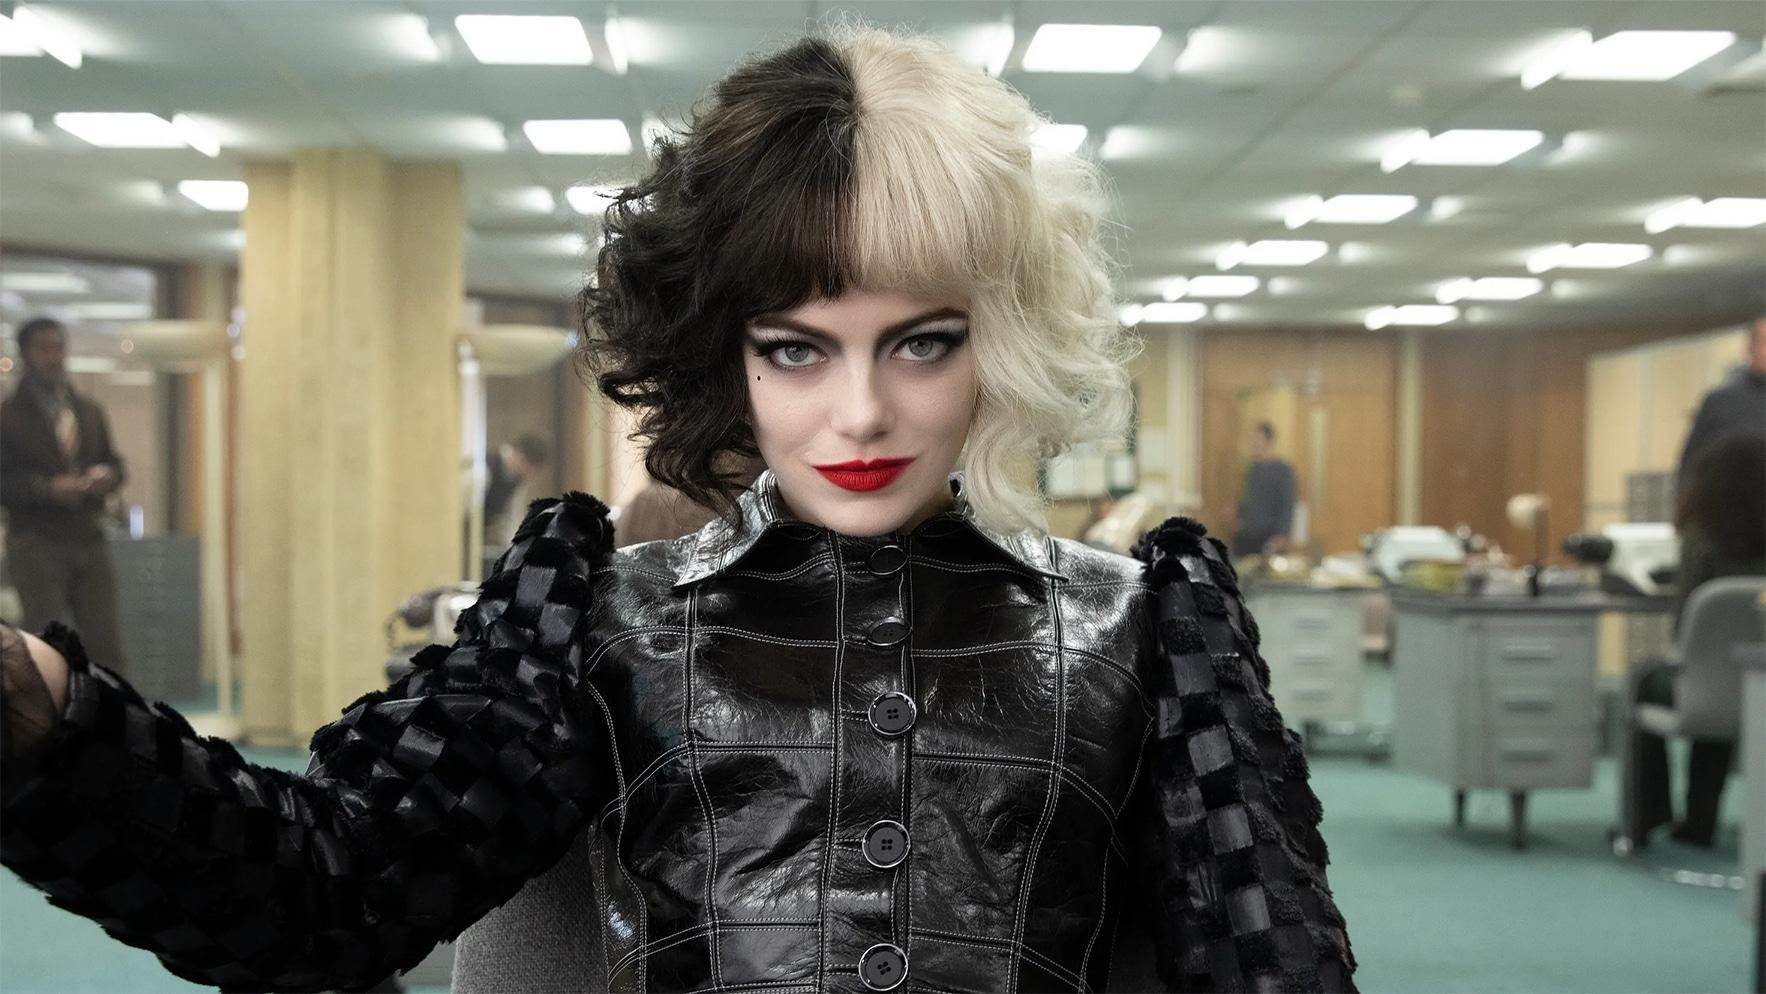 live-action Disney Cruella de Vil Emma Stone origin story unnecessary, goes too far to explain every detail